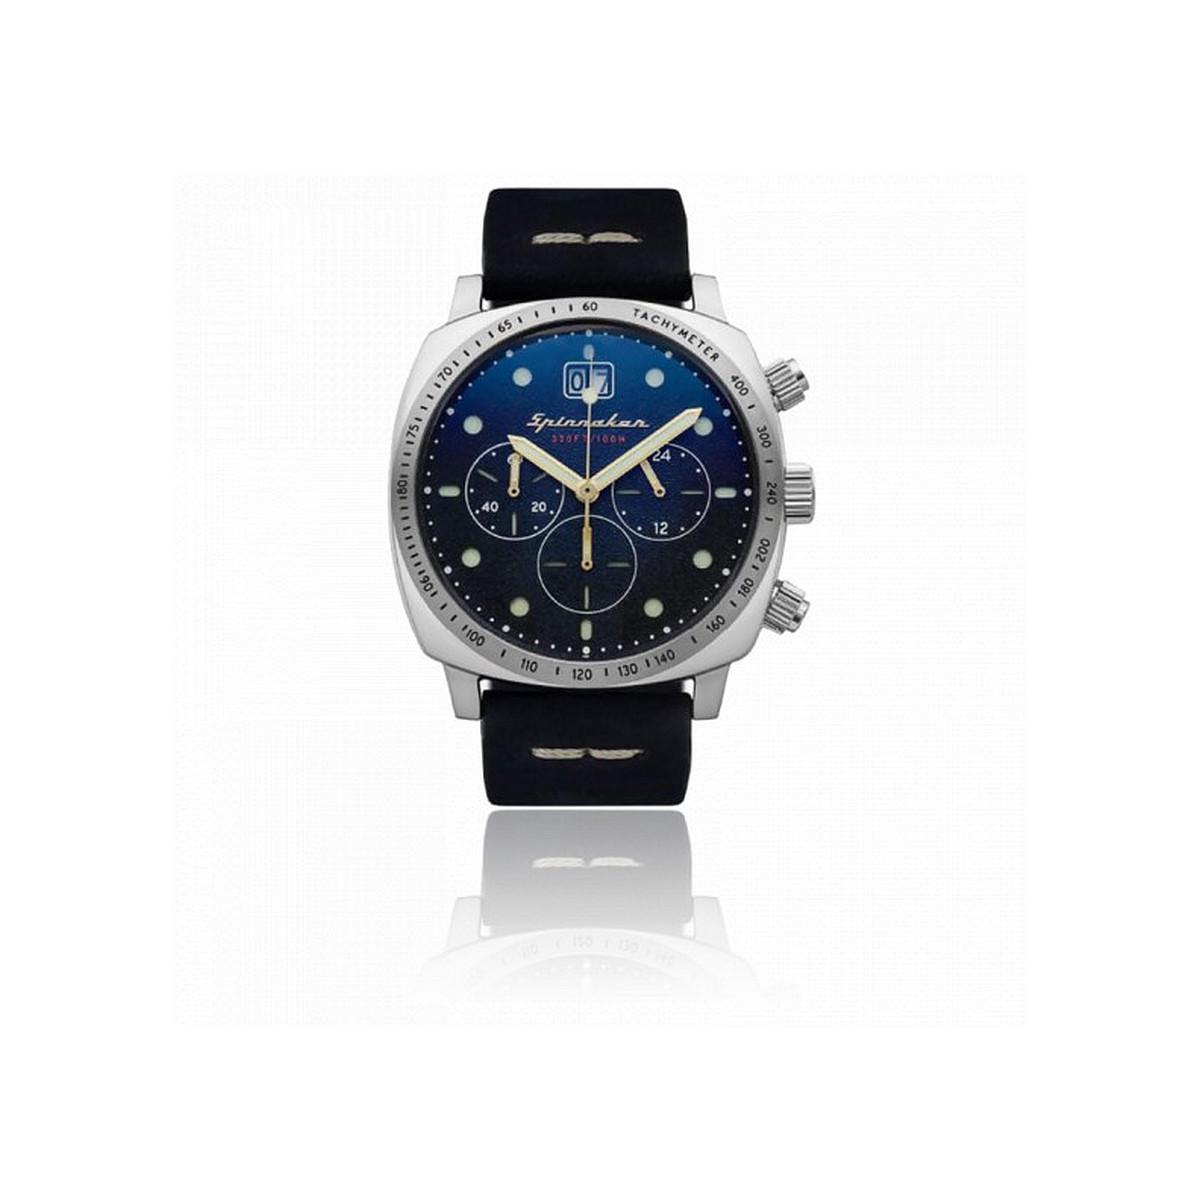 Montre Homme Spinnaker HULL Chronographe Cadran bleu Bracelet cuir bleu